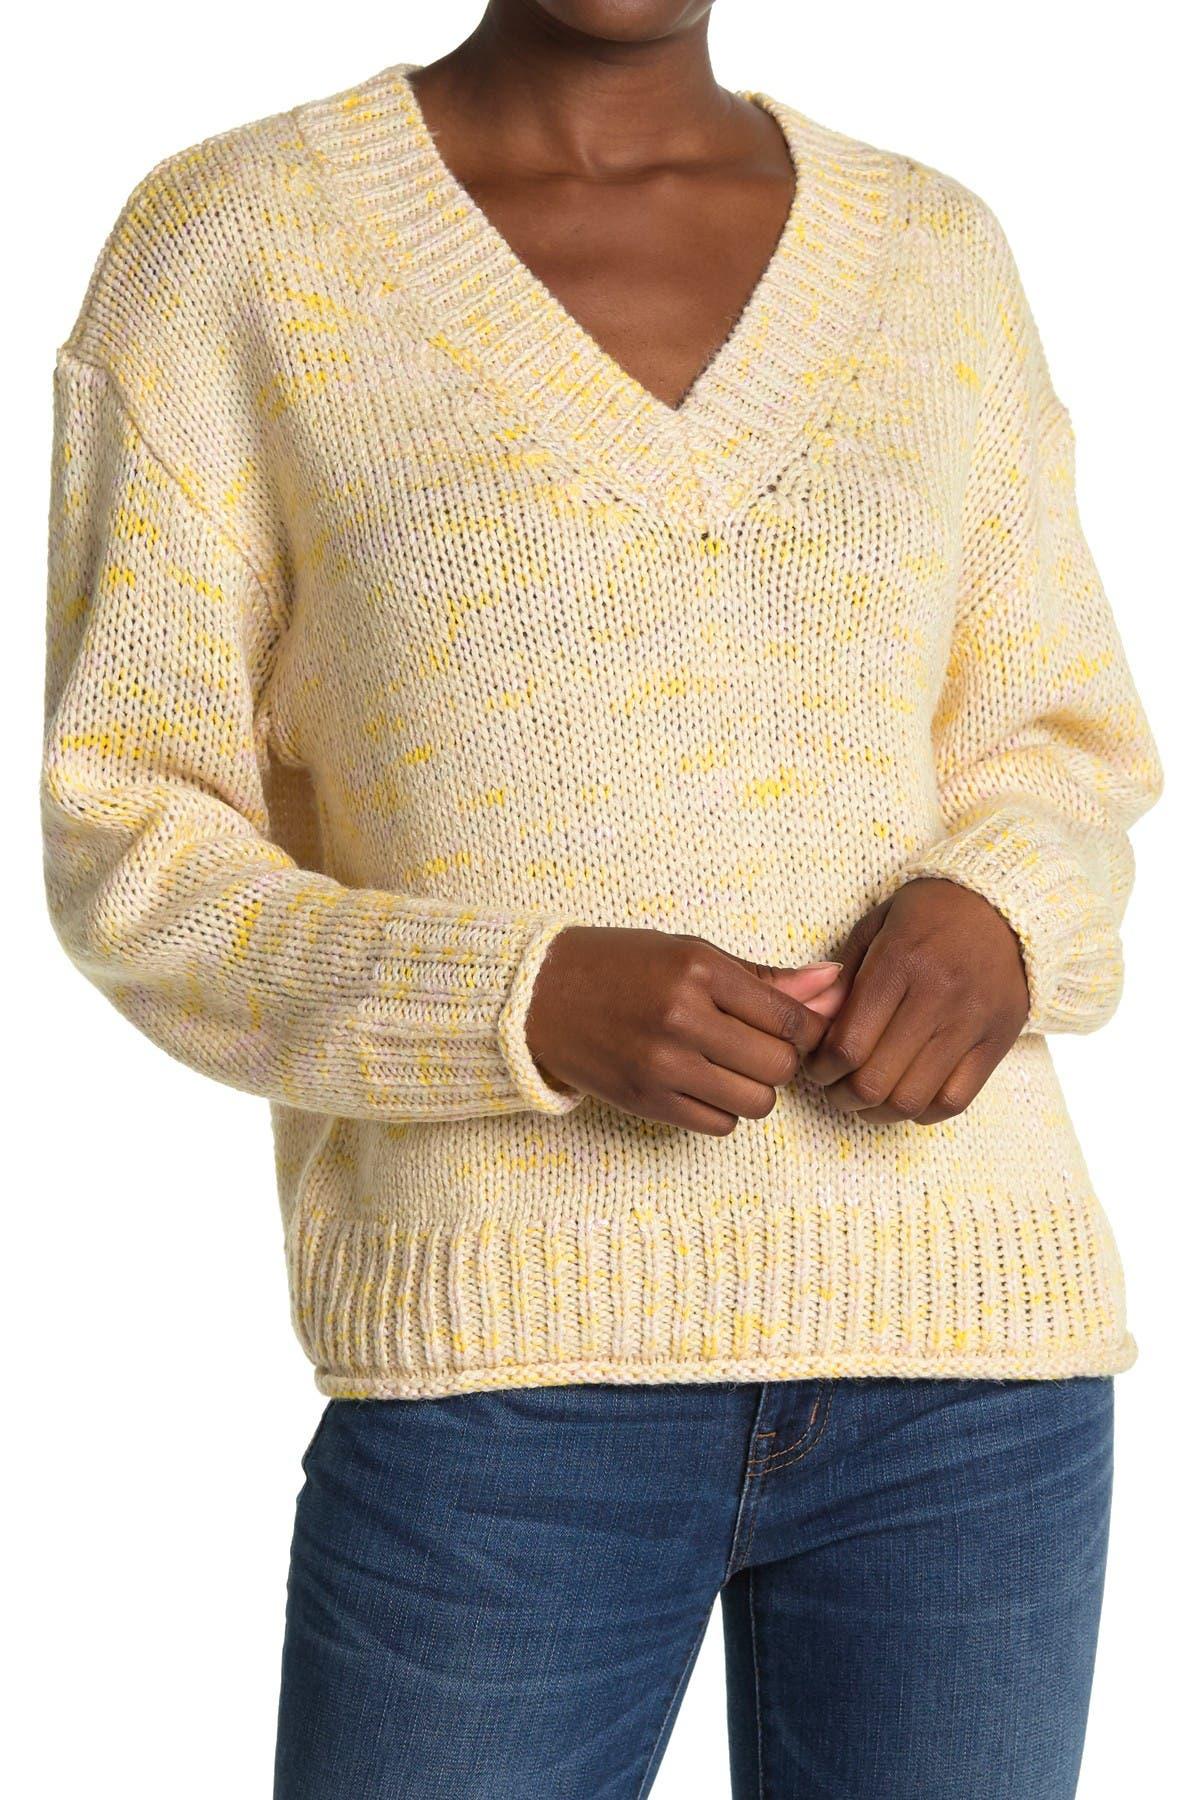 Image of ALL IN FAVOR V-Neck Dolman Sleeve Sweater